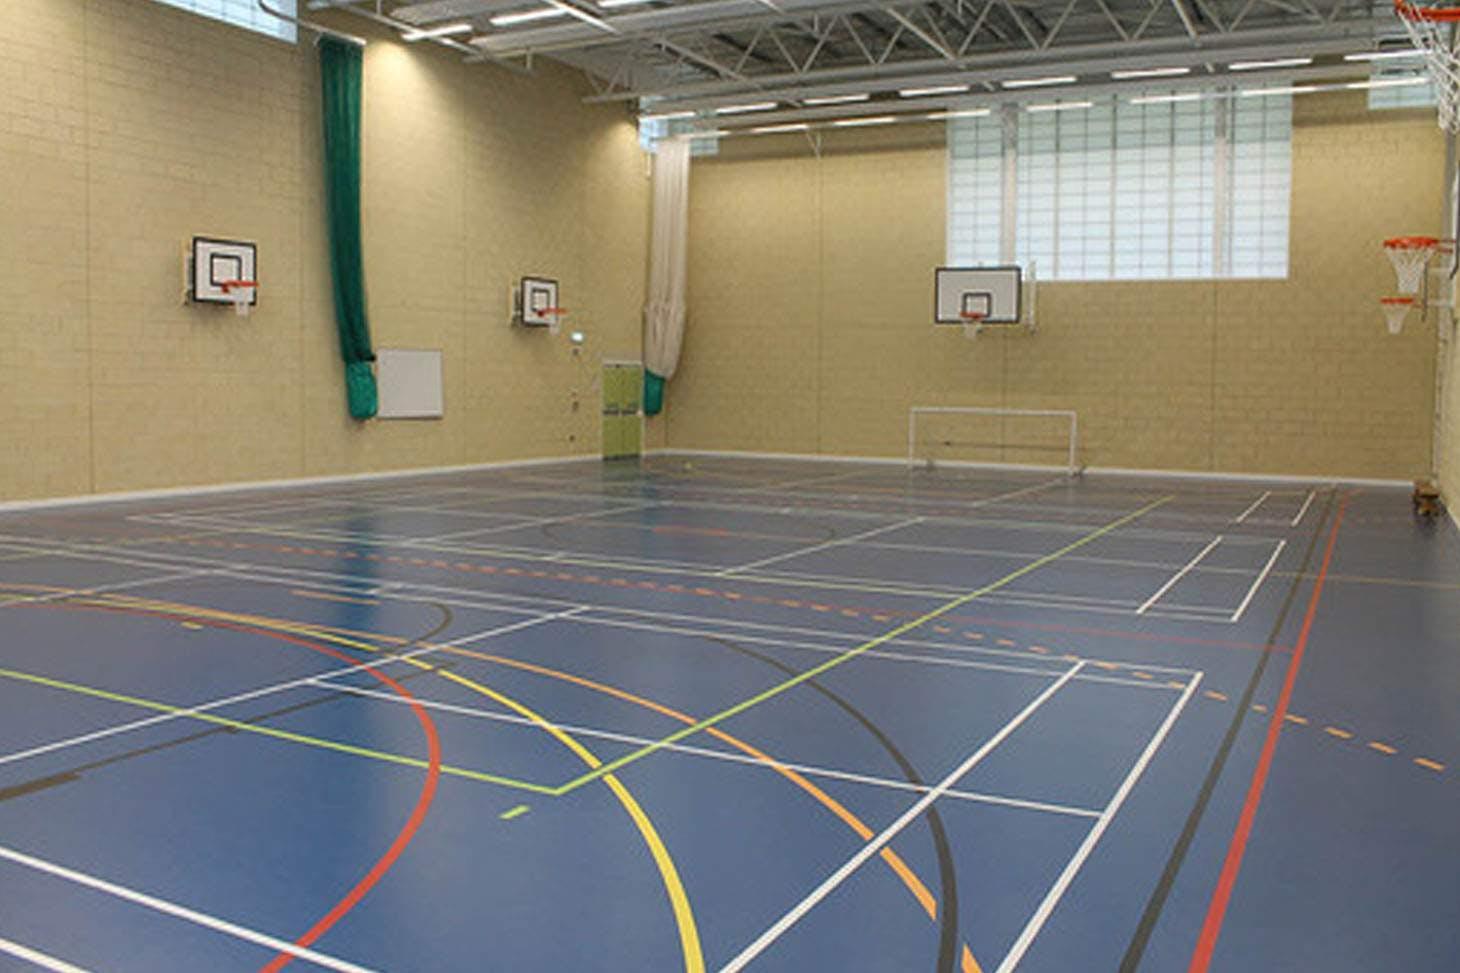 Moor Park High School and Sixth Form Indoor basketball court